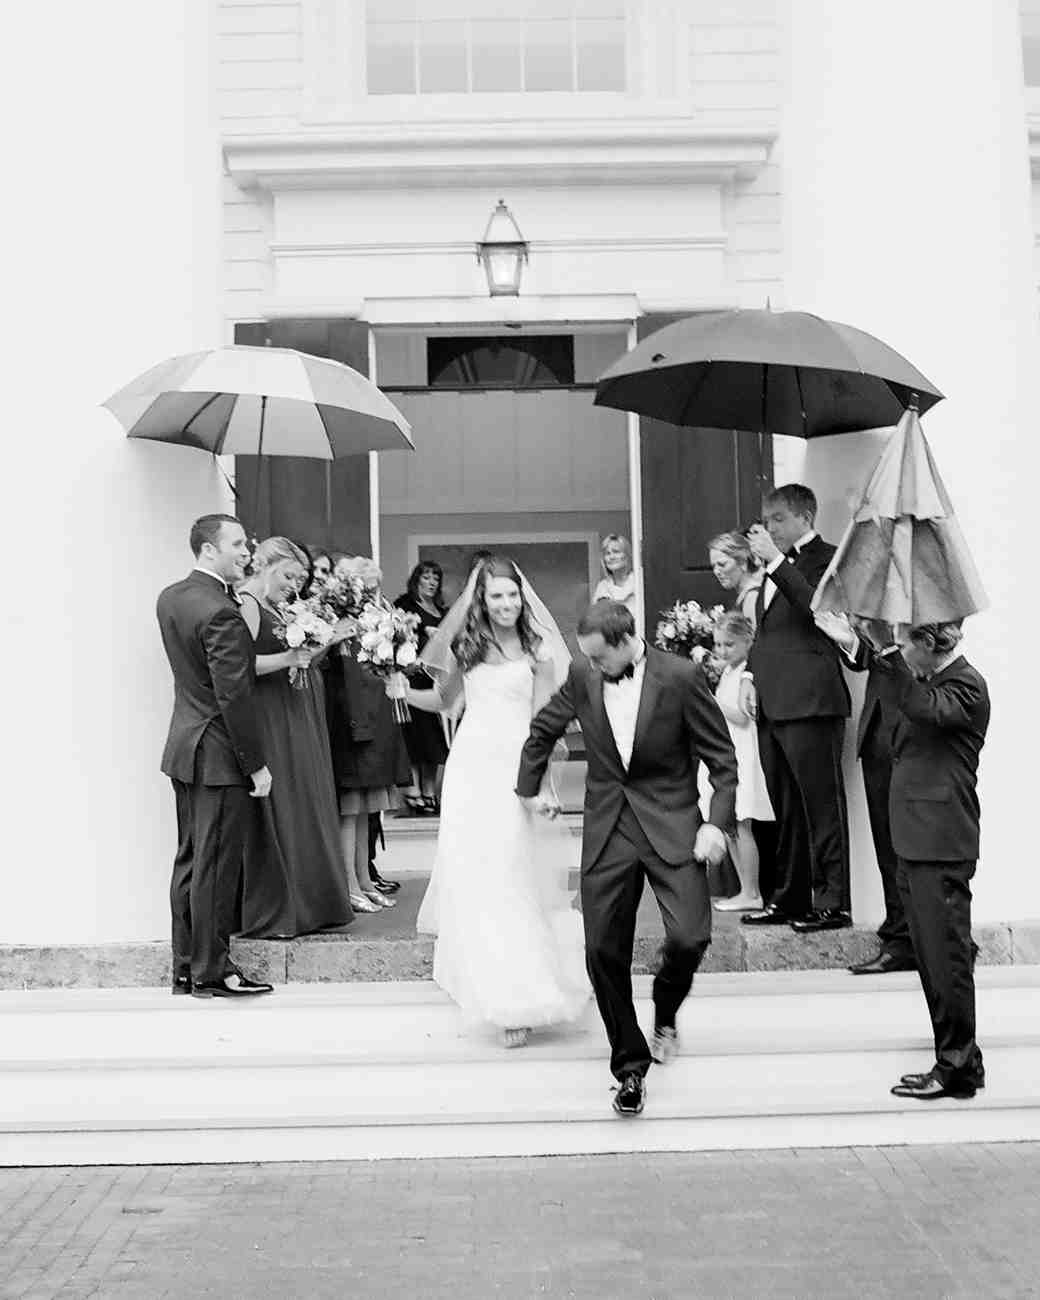 lindsay-garrett-wedding-exit-0562-s111850-0415.jpg